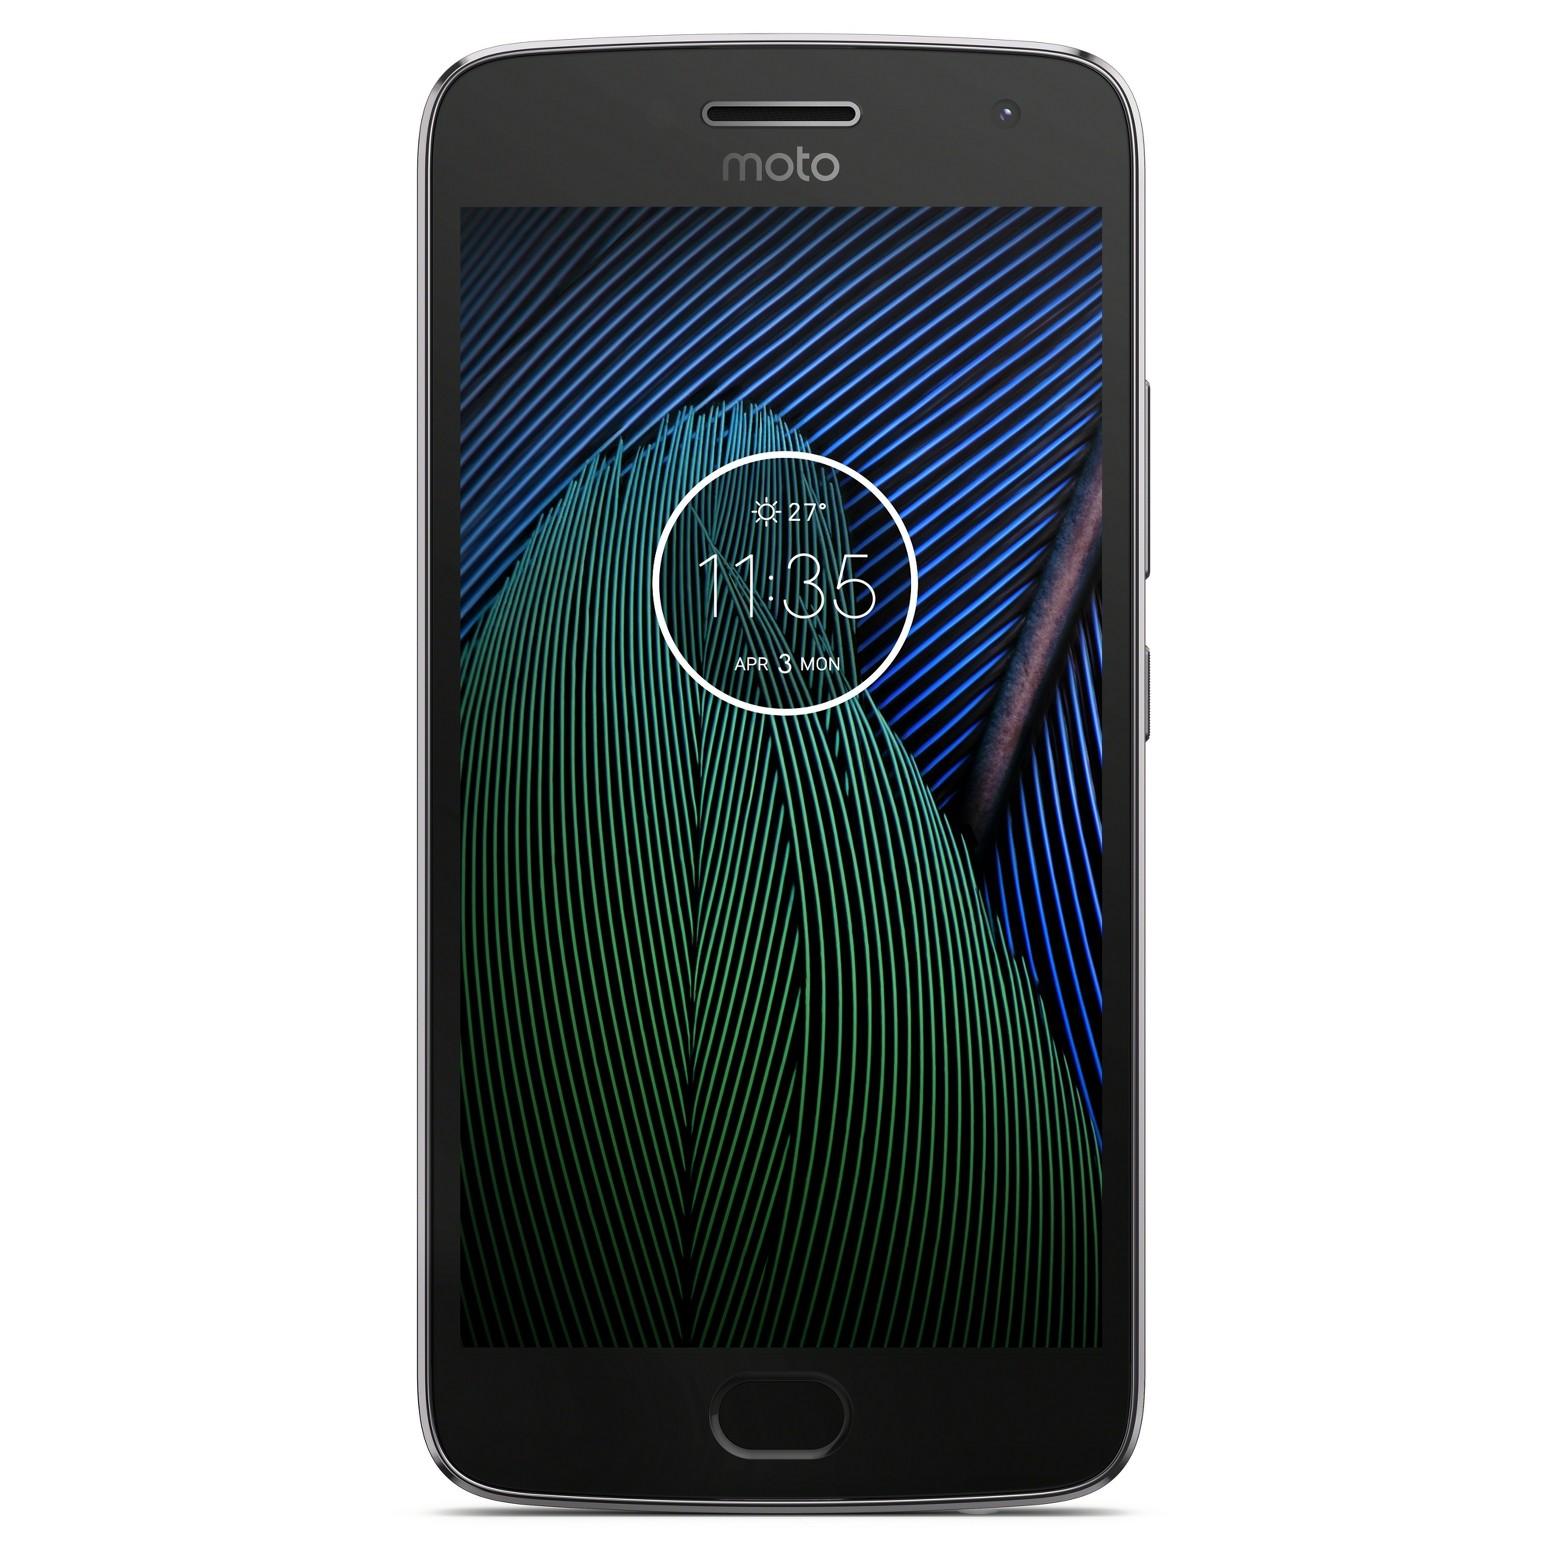 Unlocked Moto G Plus (5th Gen) 32GB for $169.99 plus taxand F/S @ target